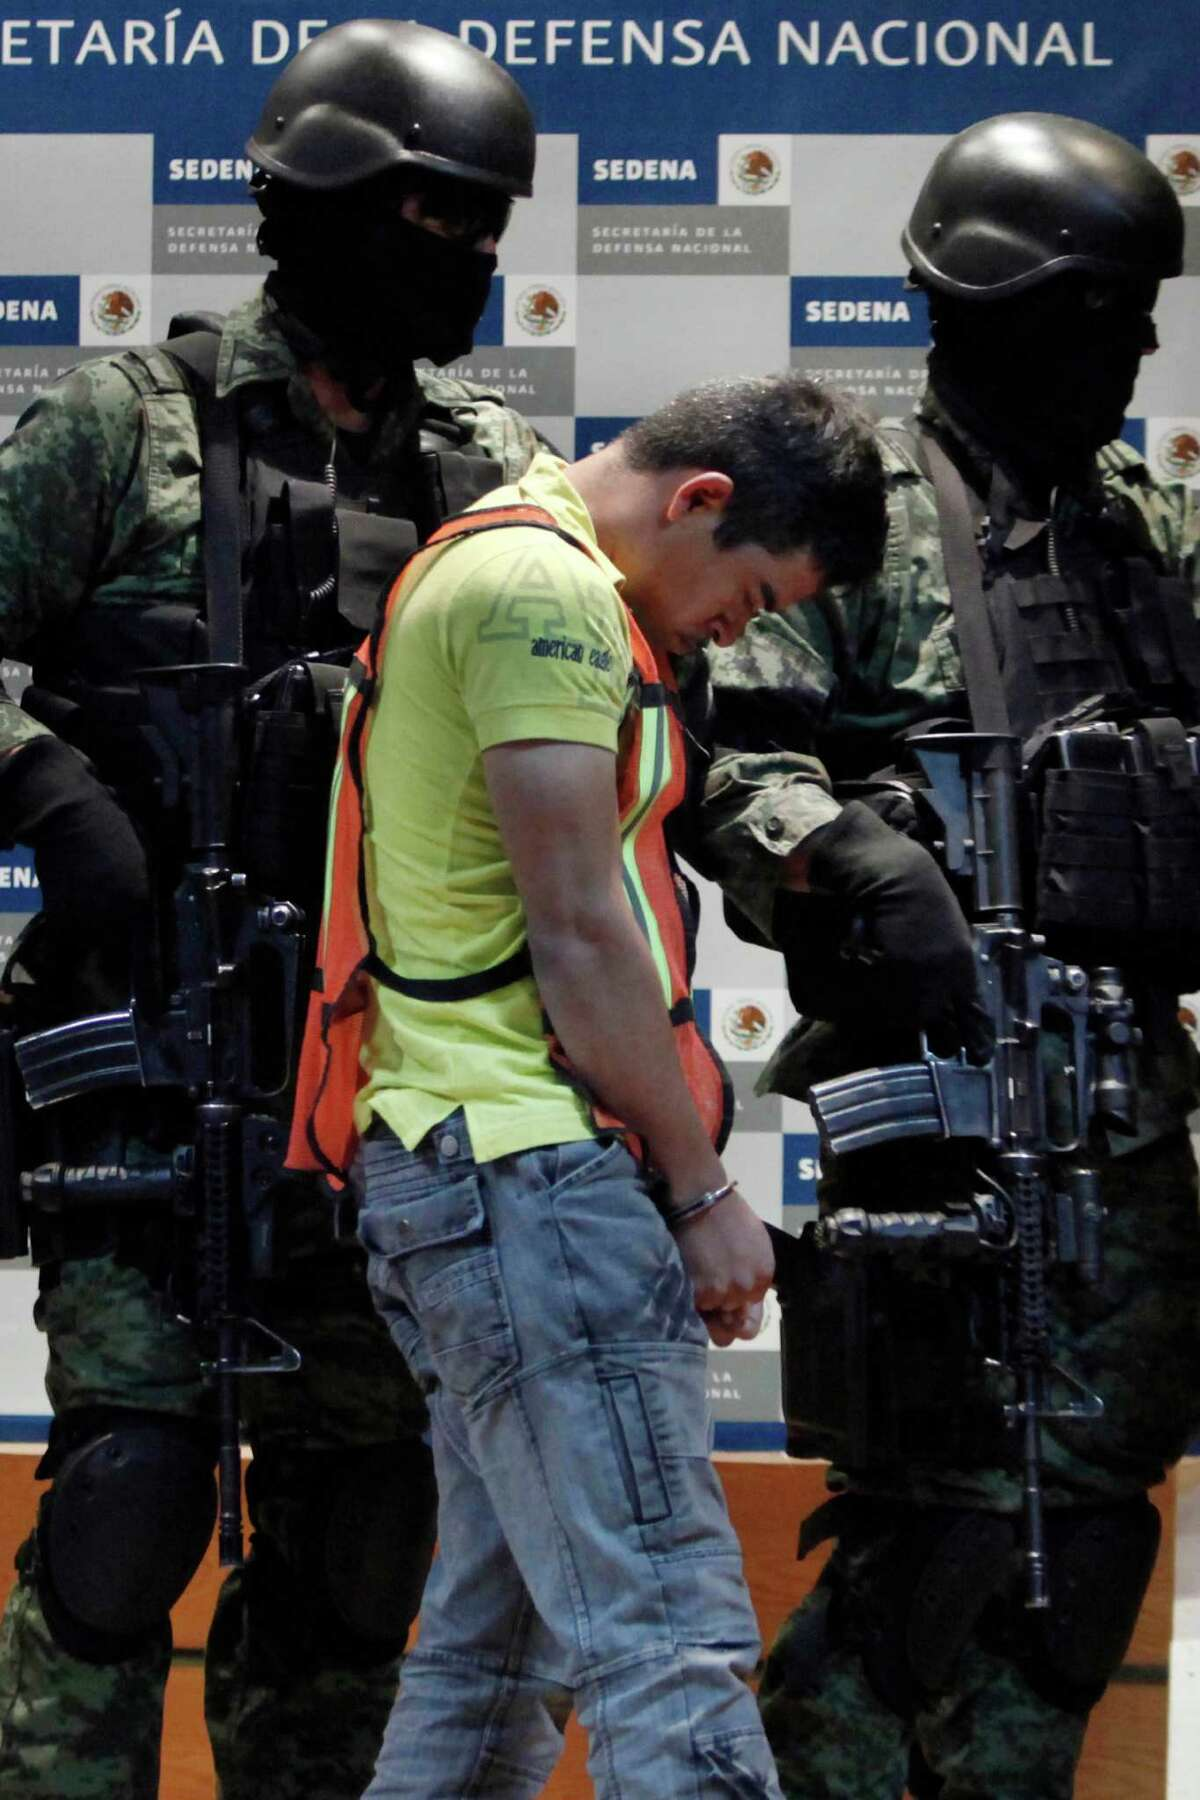 Soldiers escort Julian Zapata Espinosa, aka